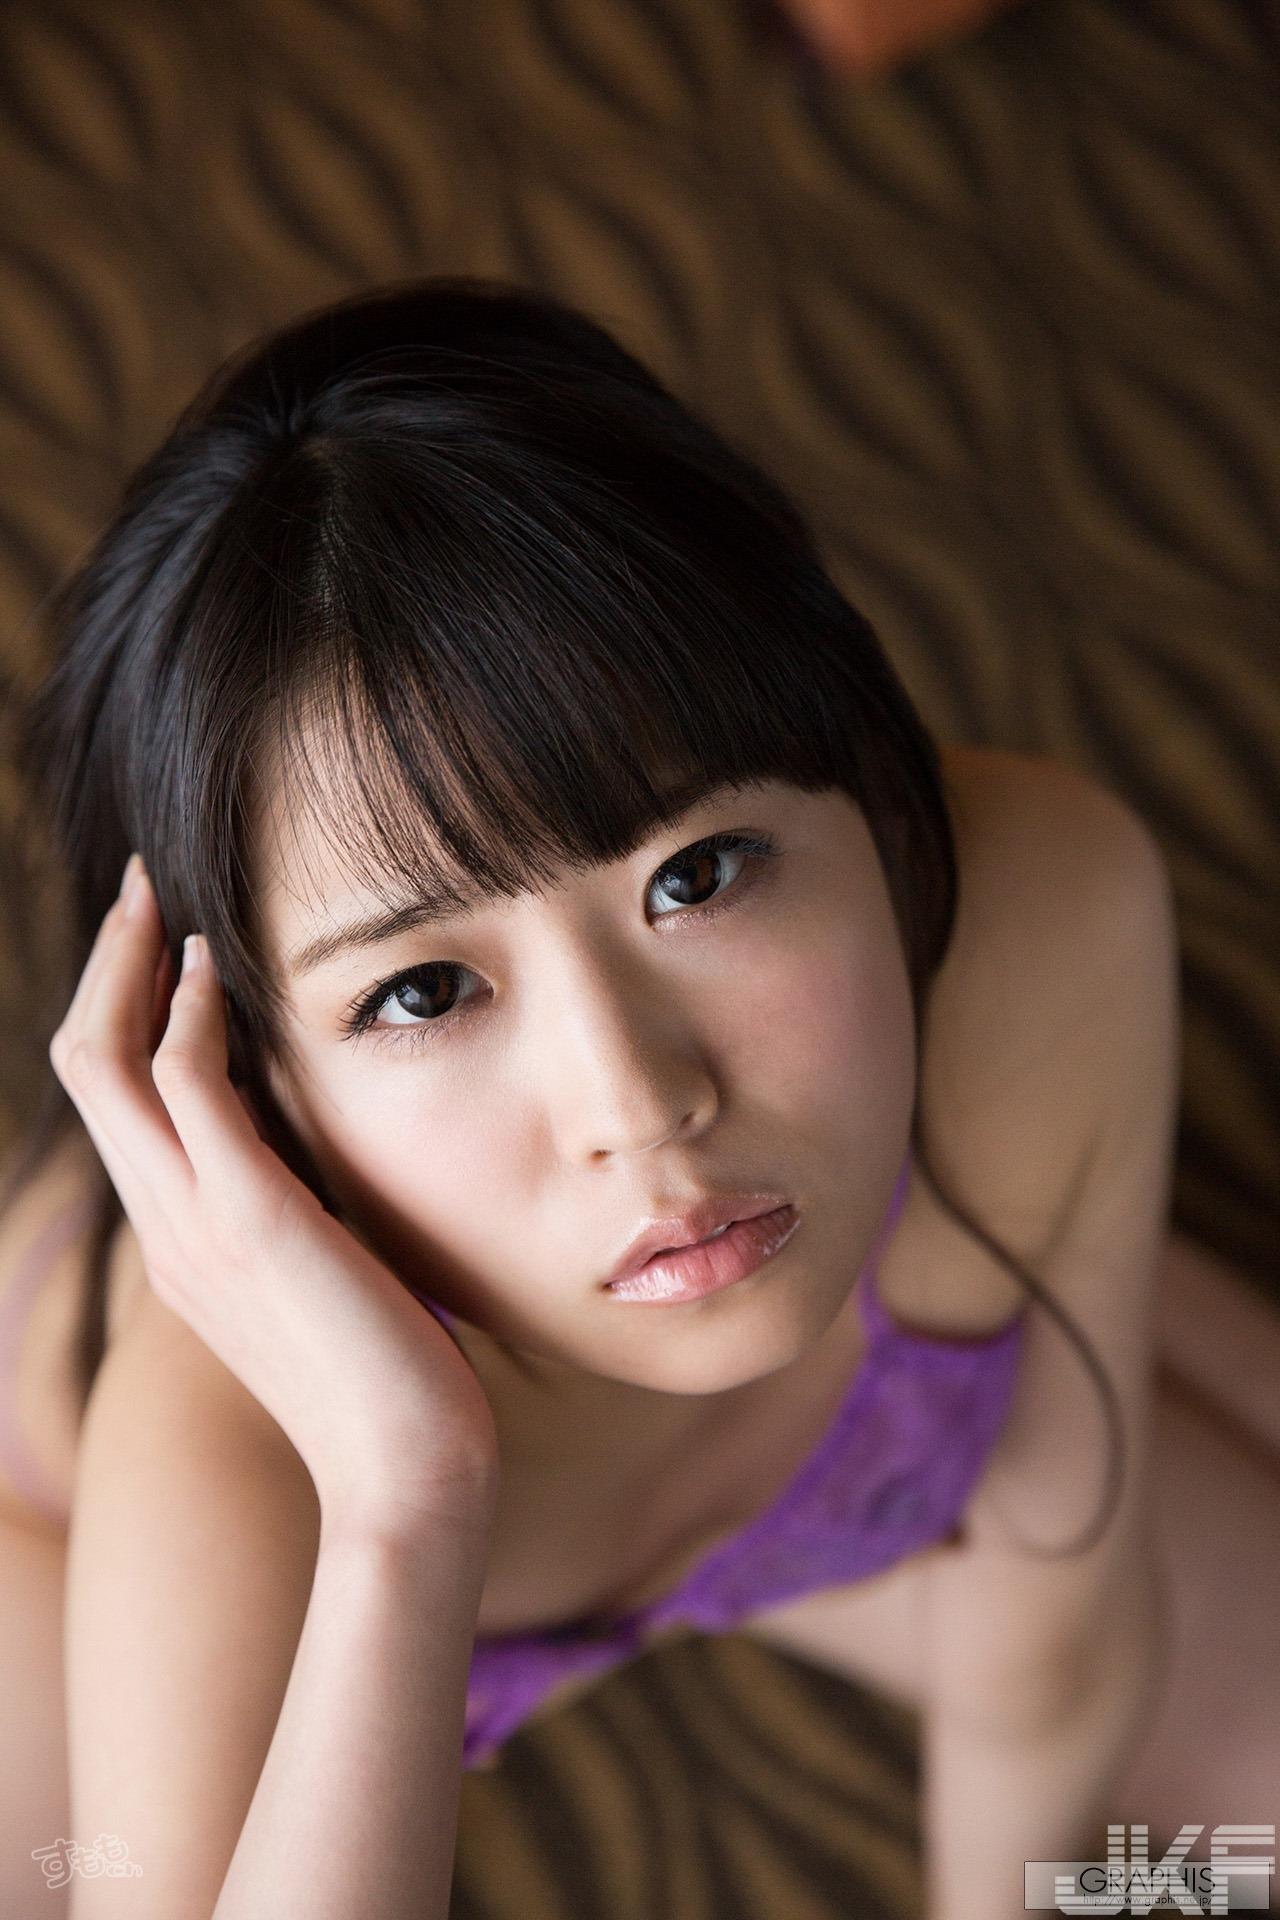 sakura_yura_5088-162.jpg